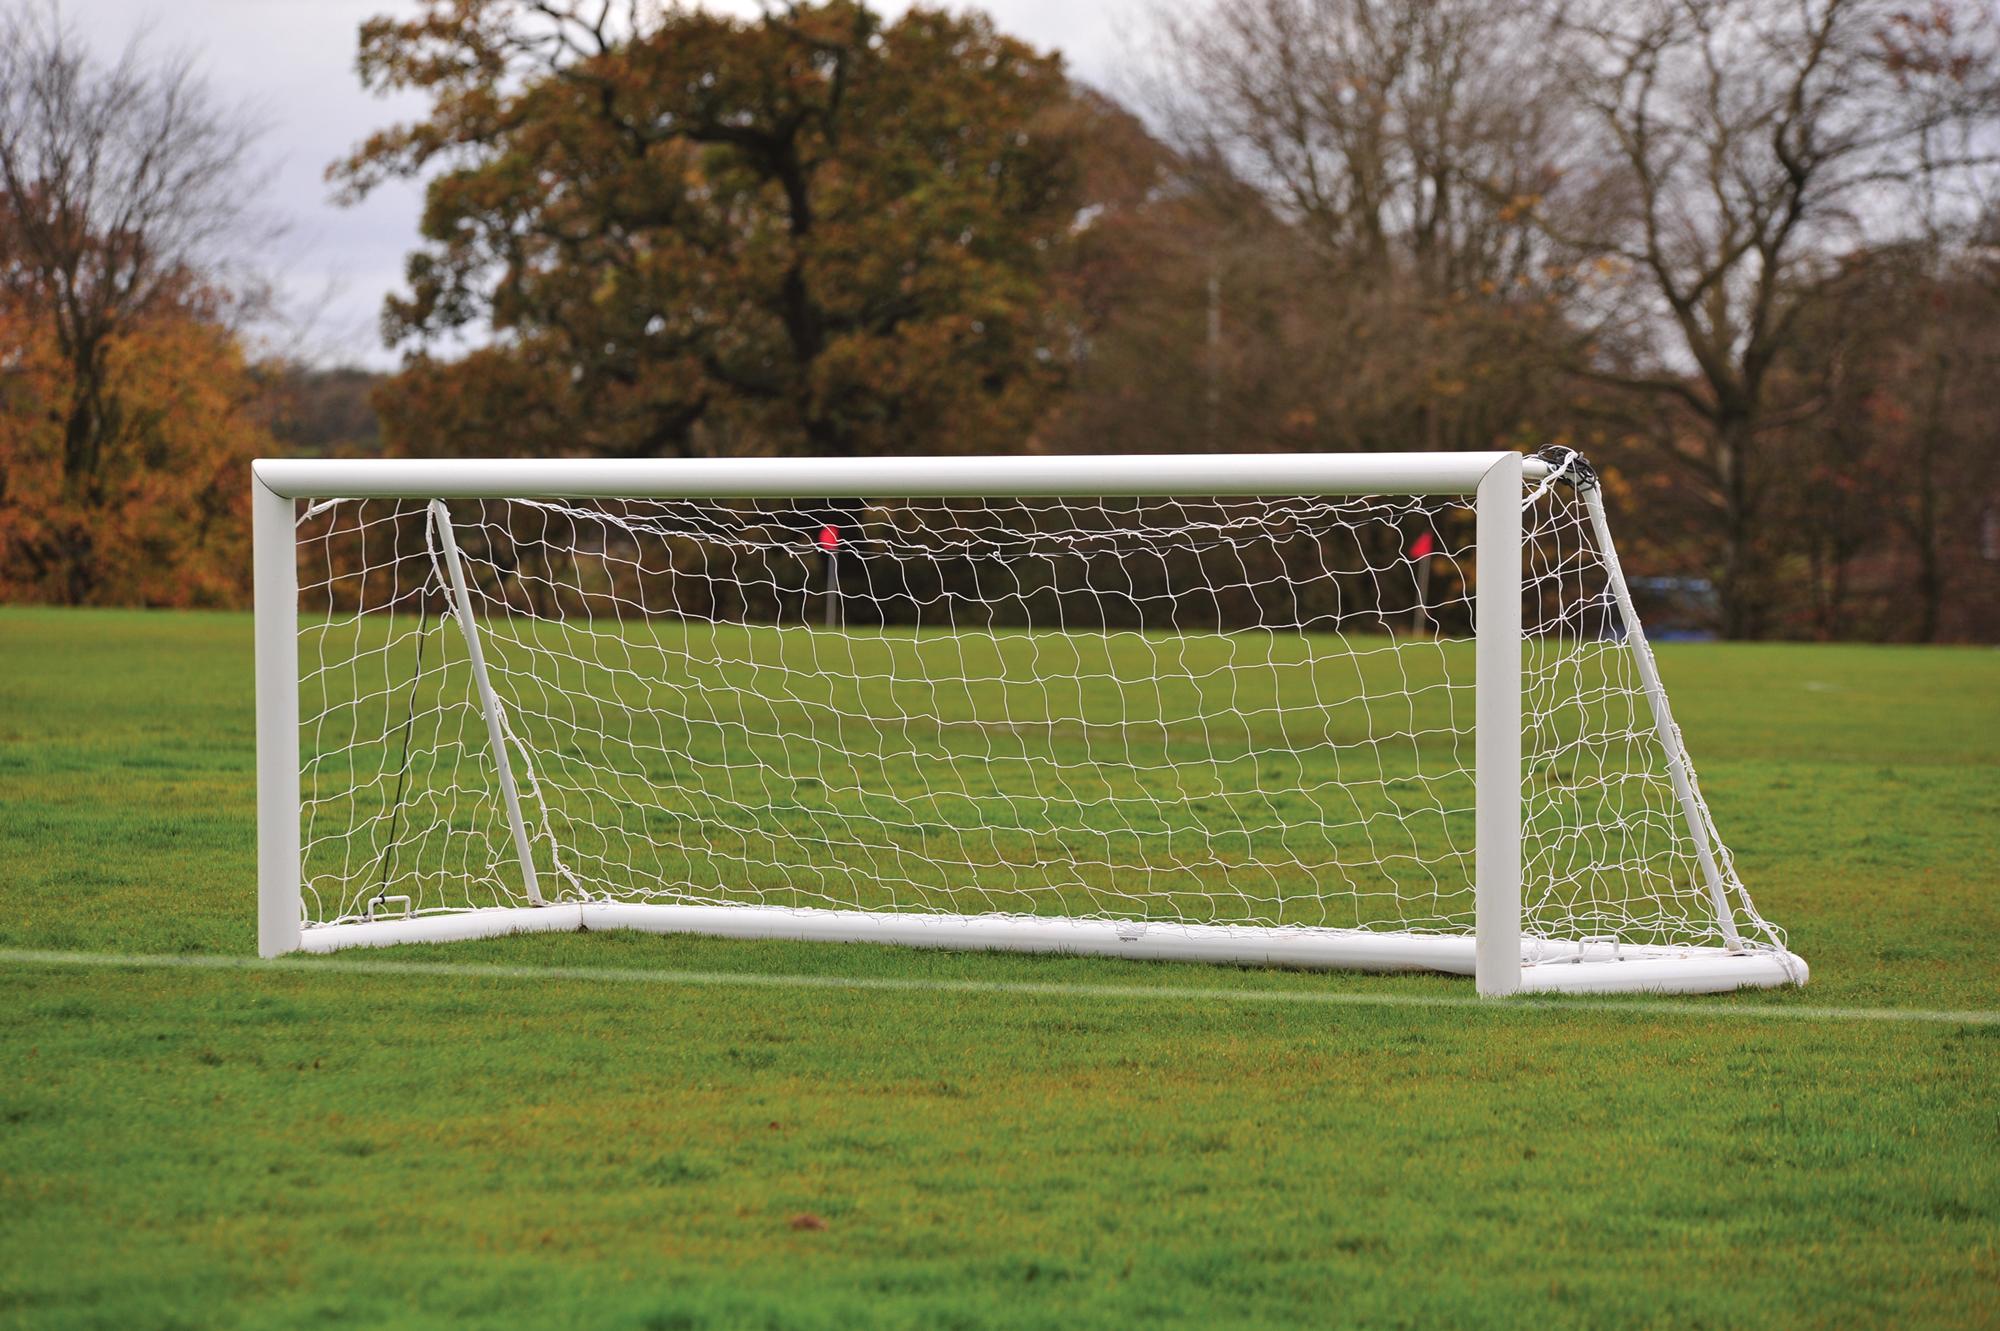 Freestanding Elliptical Aluminium Football Goals Package - 16' x 4'